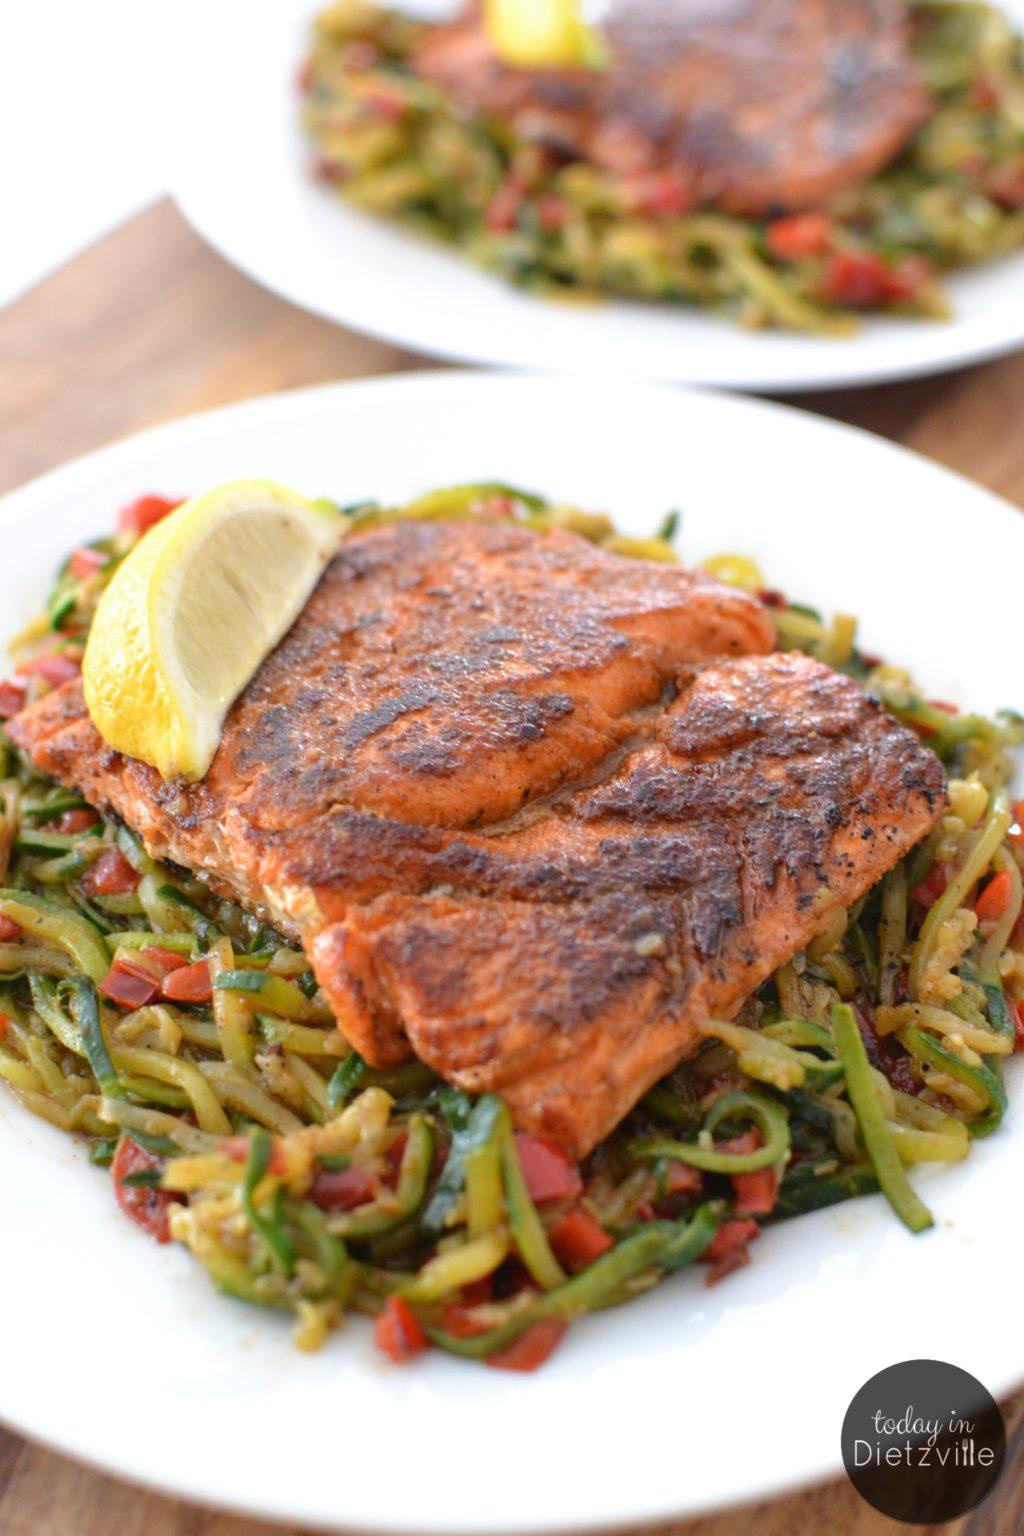 Salmon Cajun Food Recipes Sides